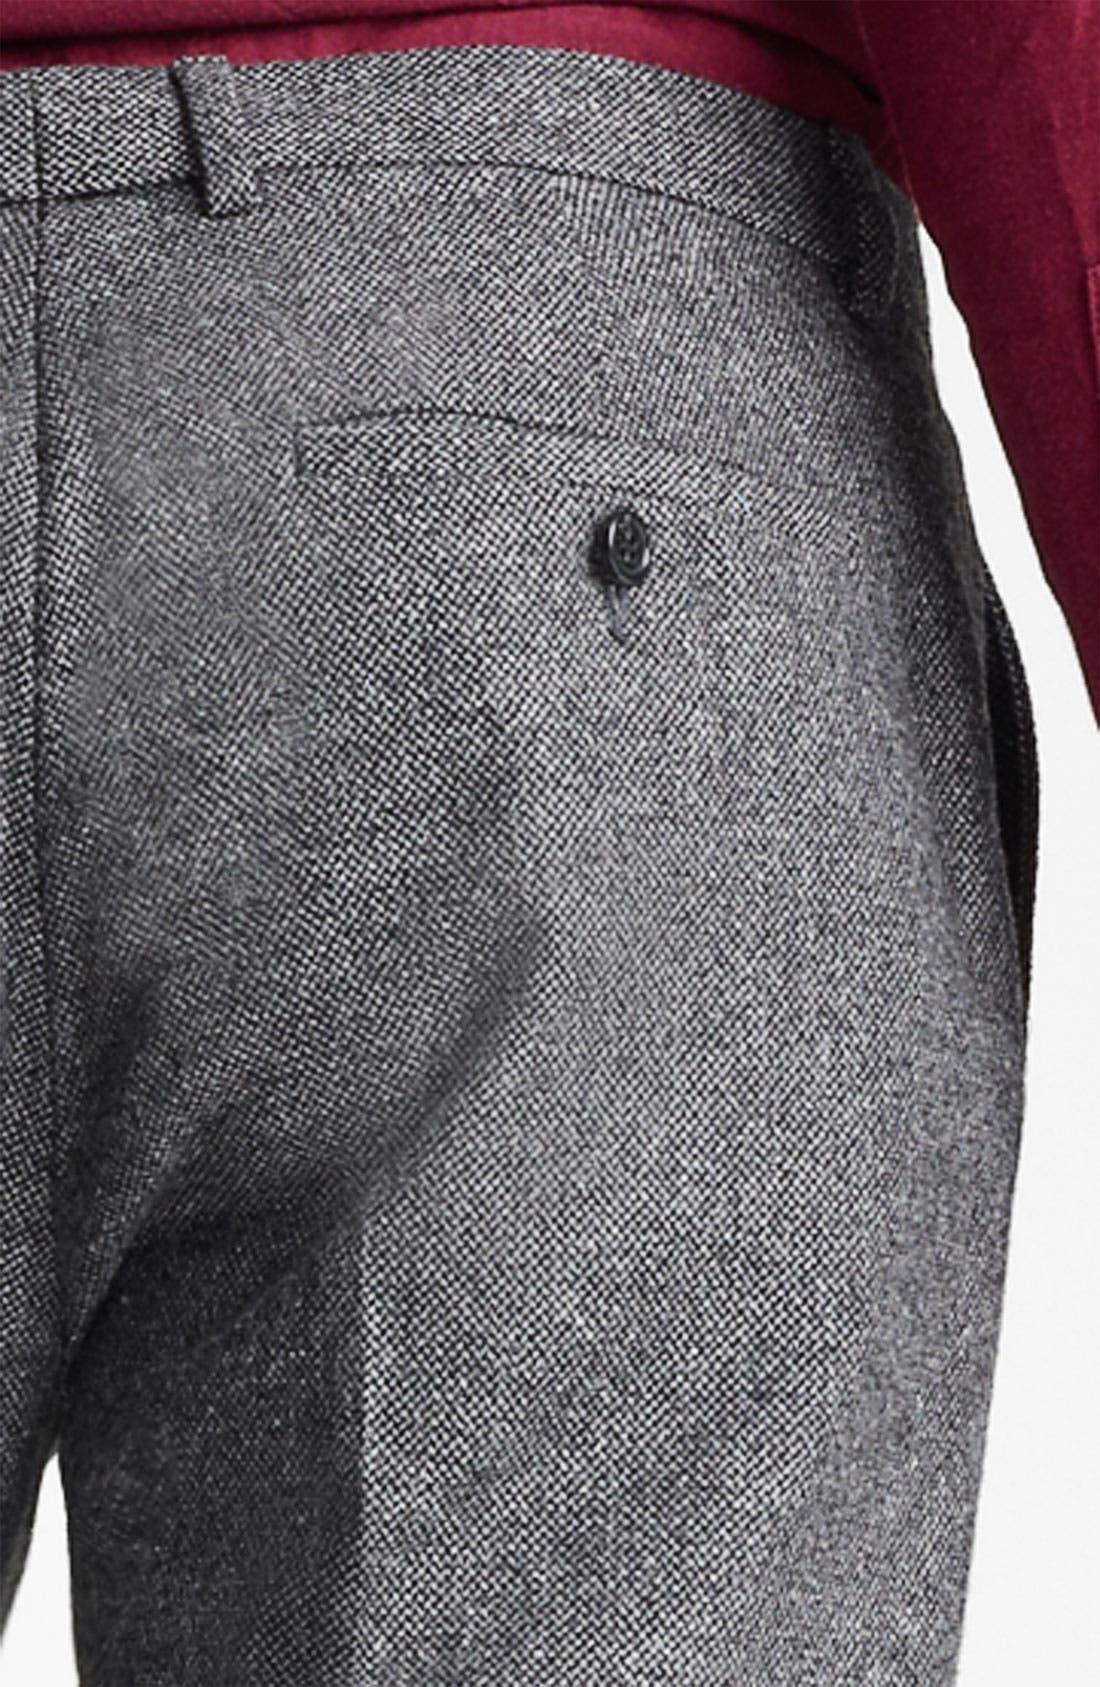 TOPMAN, 'Vento' Tweed Skinny Trousers, Alternate thumbnail 2, color, 020